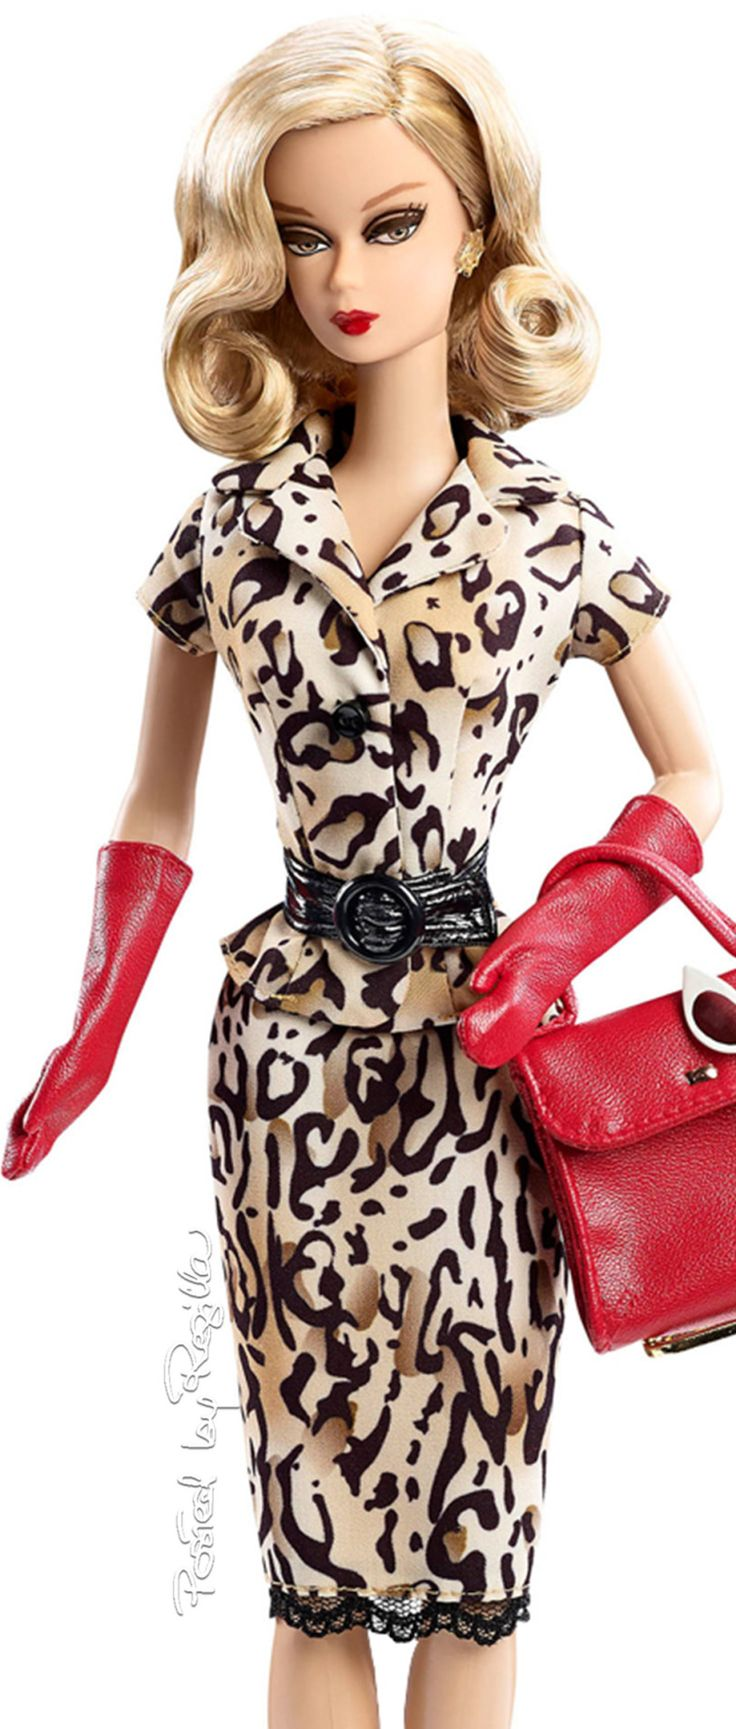 Regilla ⚜ Charlotte Olympia's Barbie